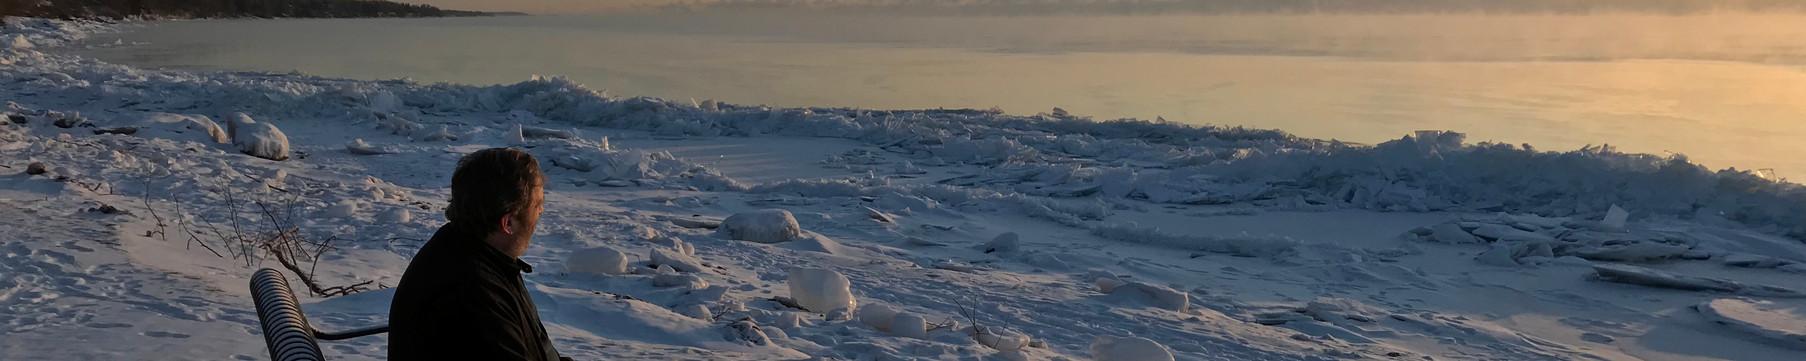 Robert Mueller - Lake Superior